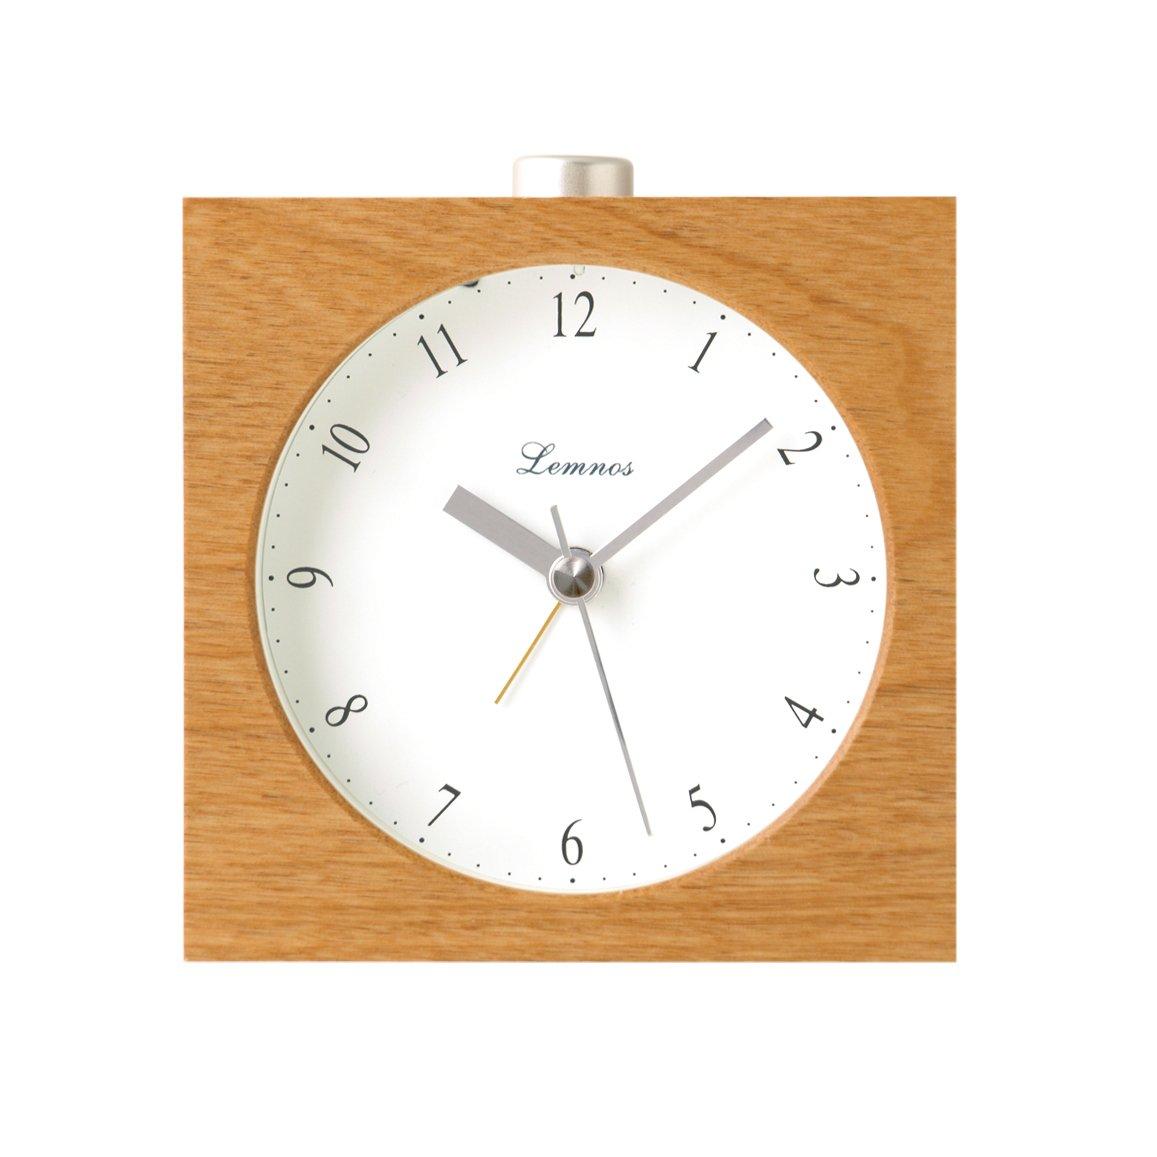 Lemnos Nocturne アラーム時計 ナチュラル PA09-10 NT B002XZ3VSSナチュラル